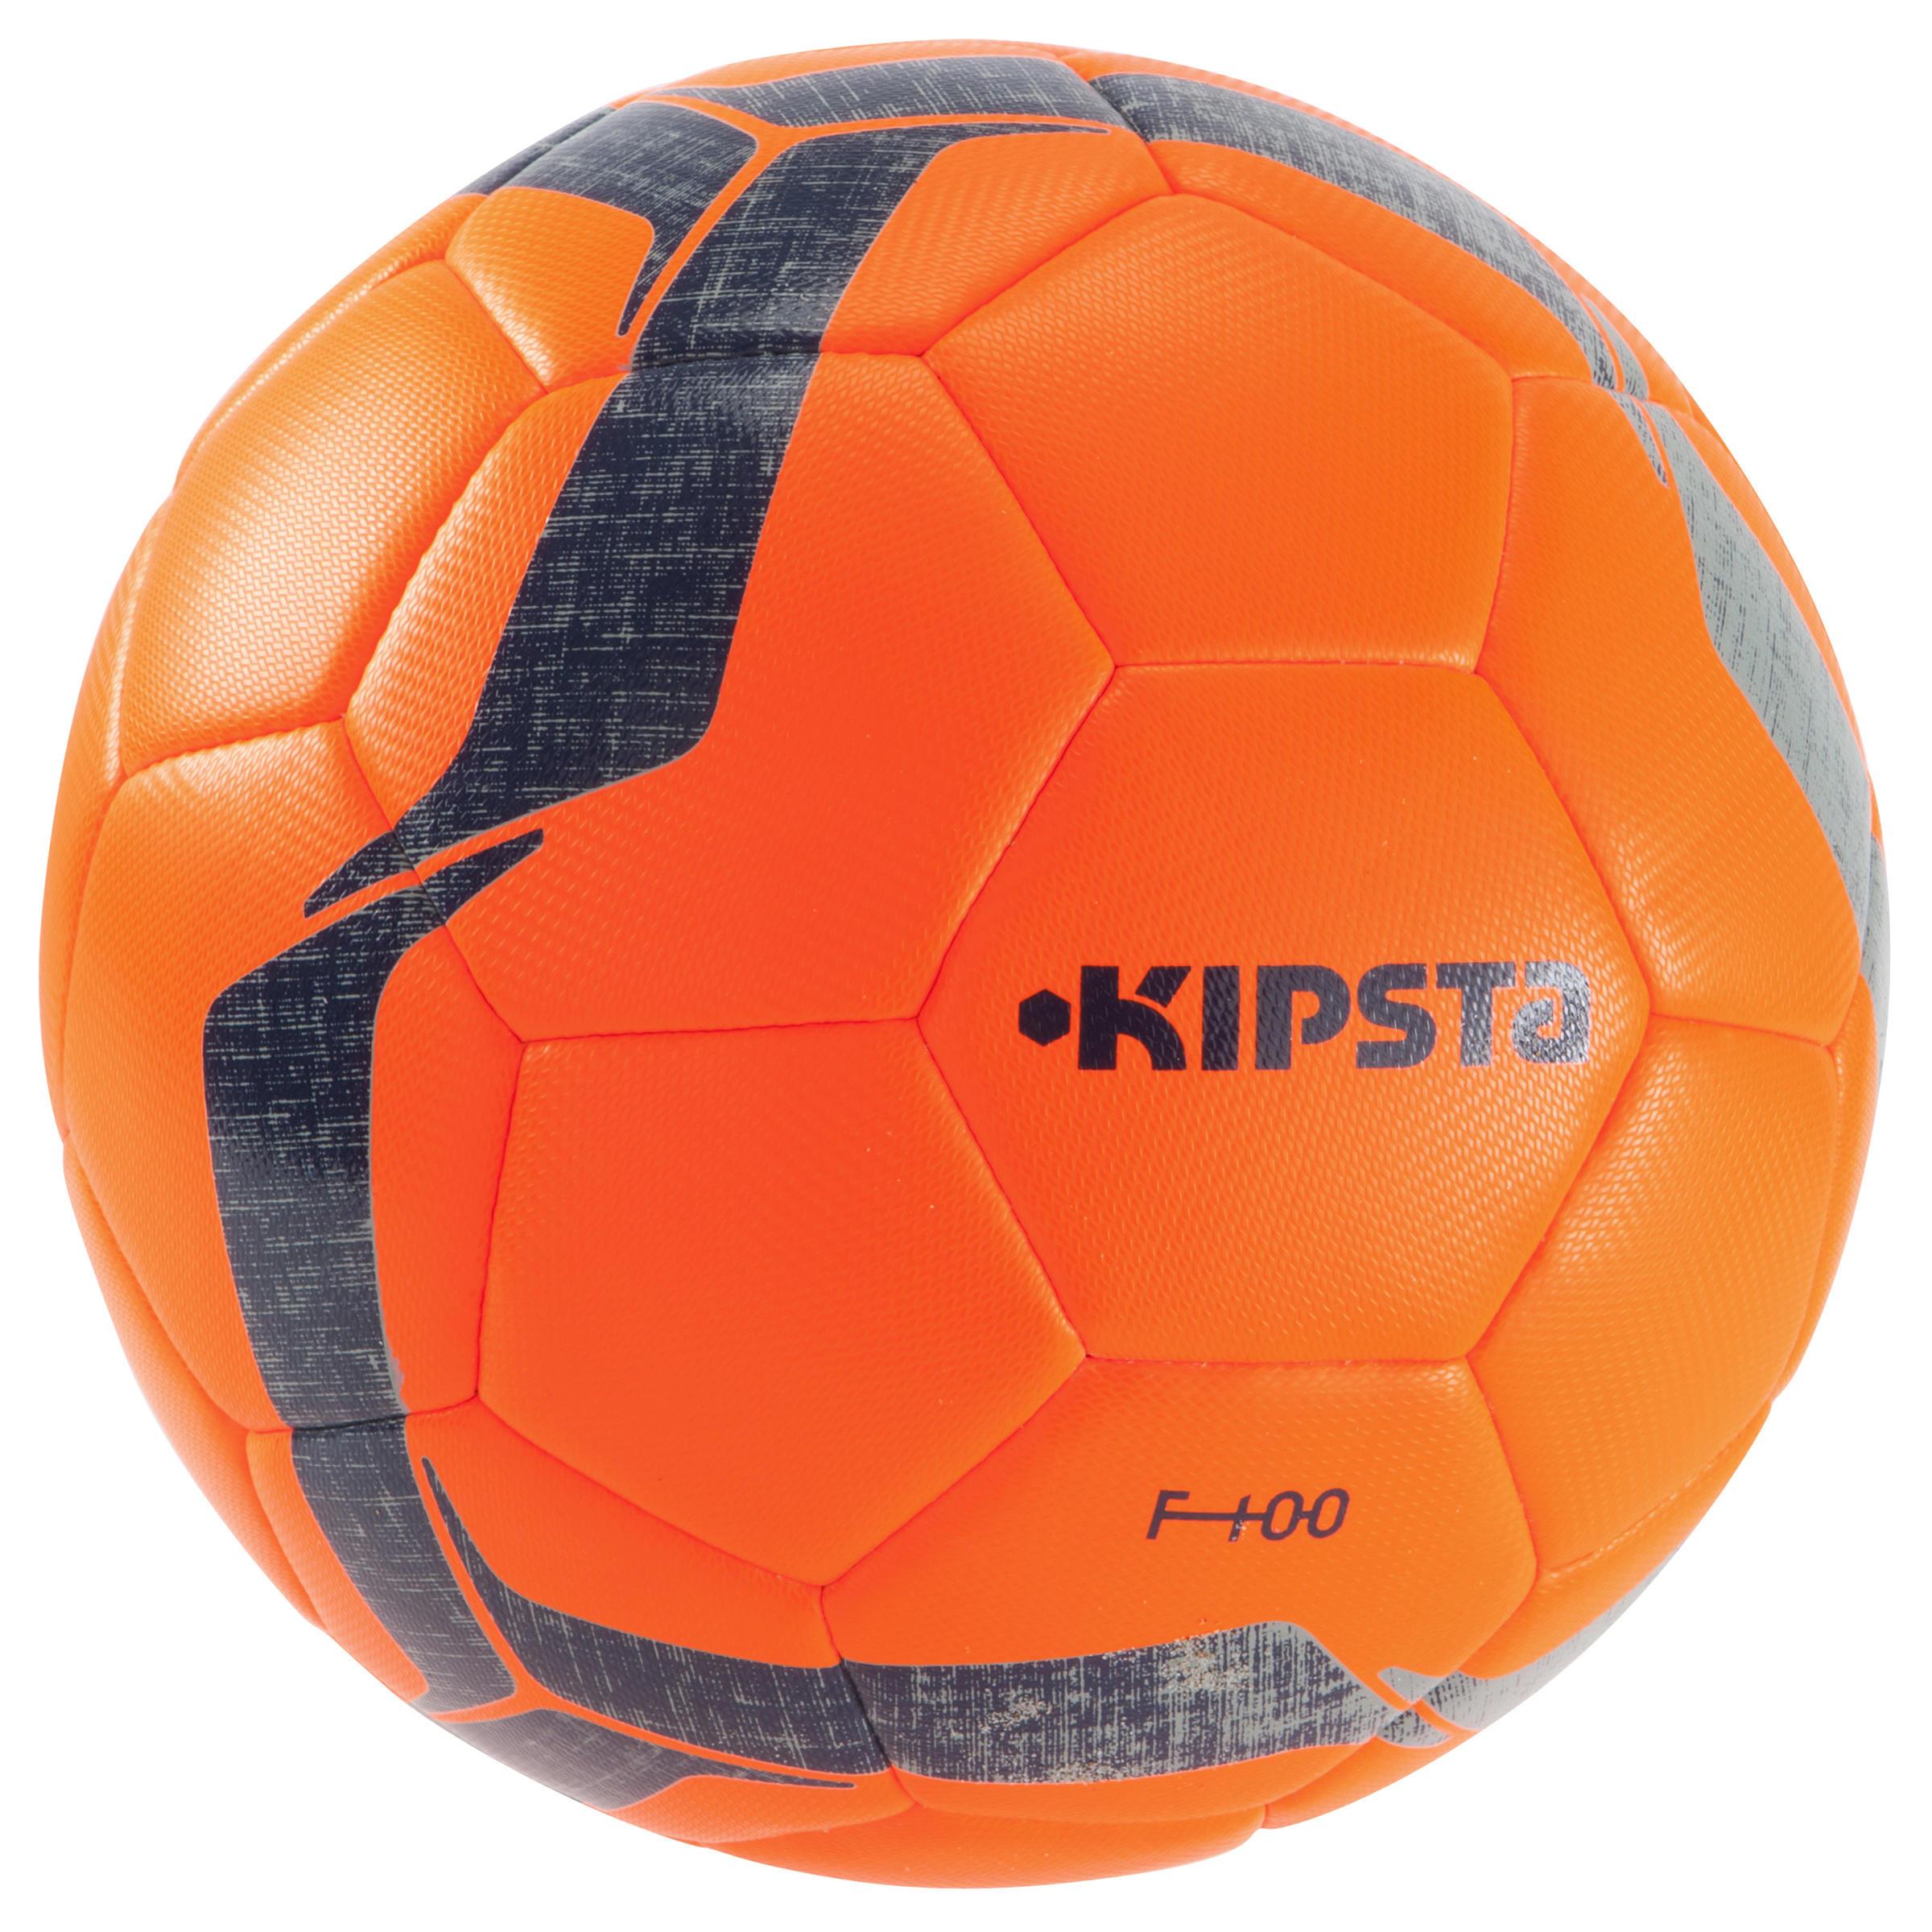 Football ball Size 5 F100 Hybrid - Orange